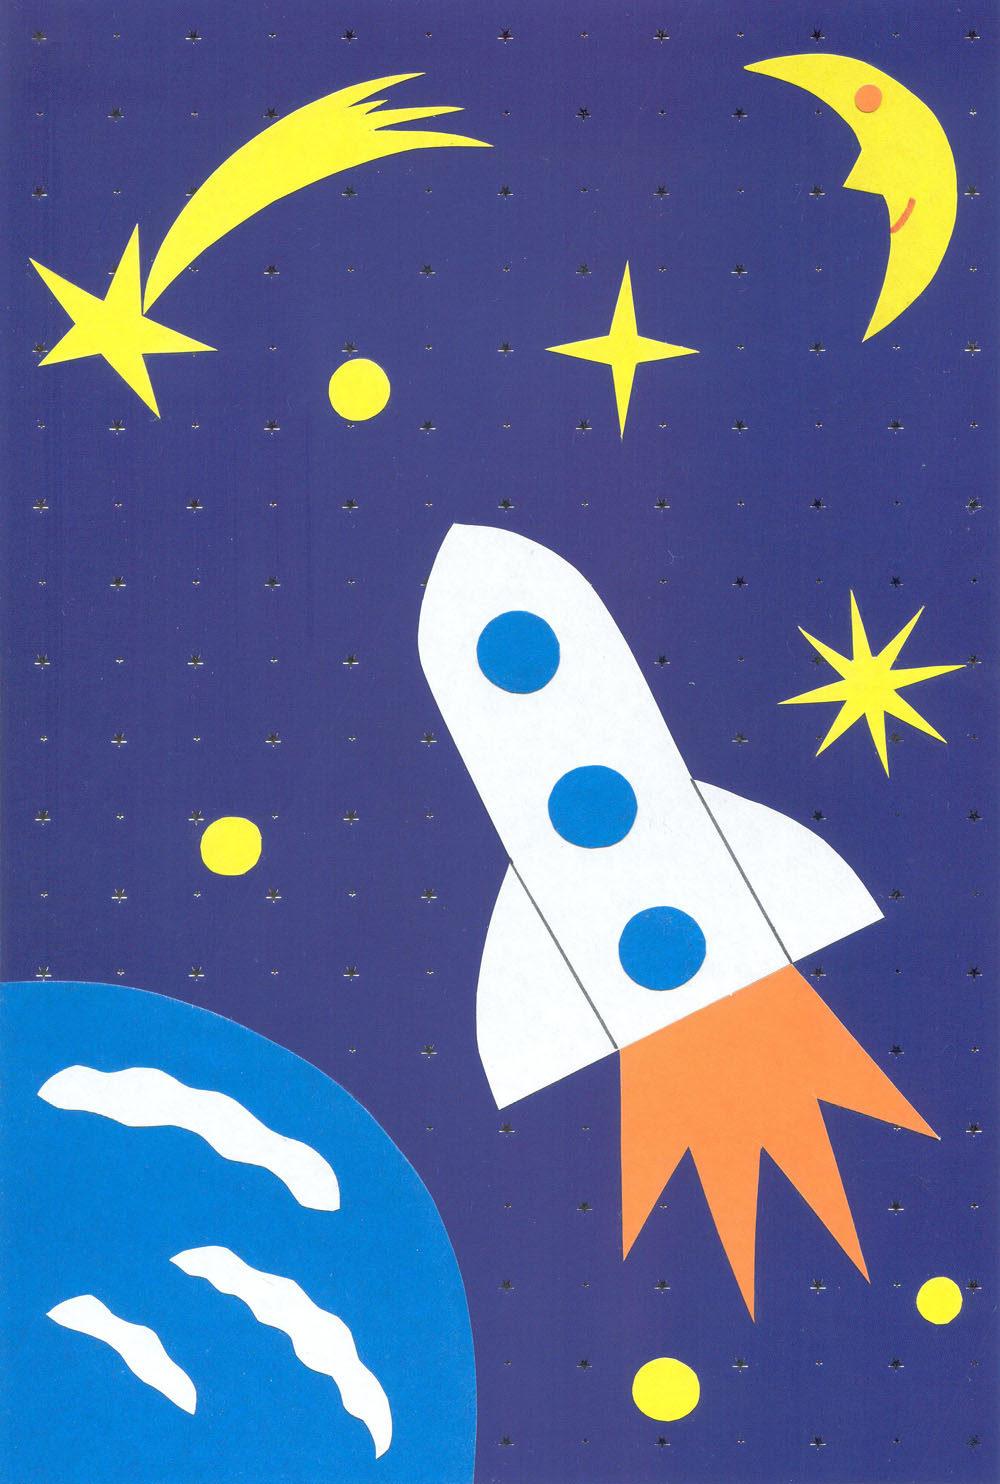 Открытки открытка, открытка ко дню космонавтики 4 класс